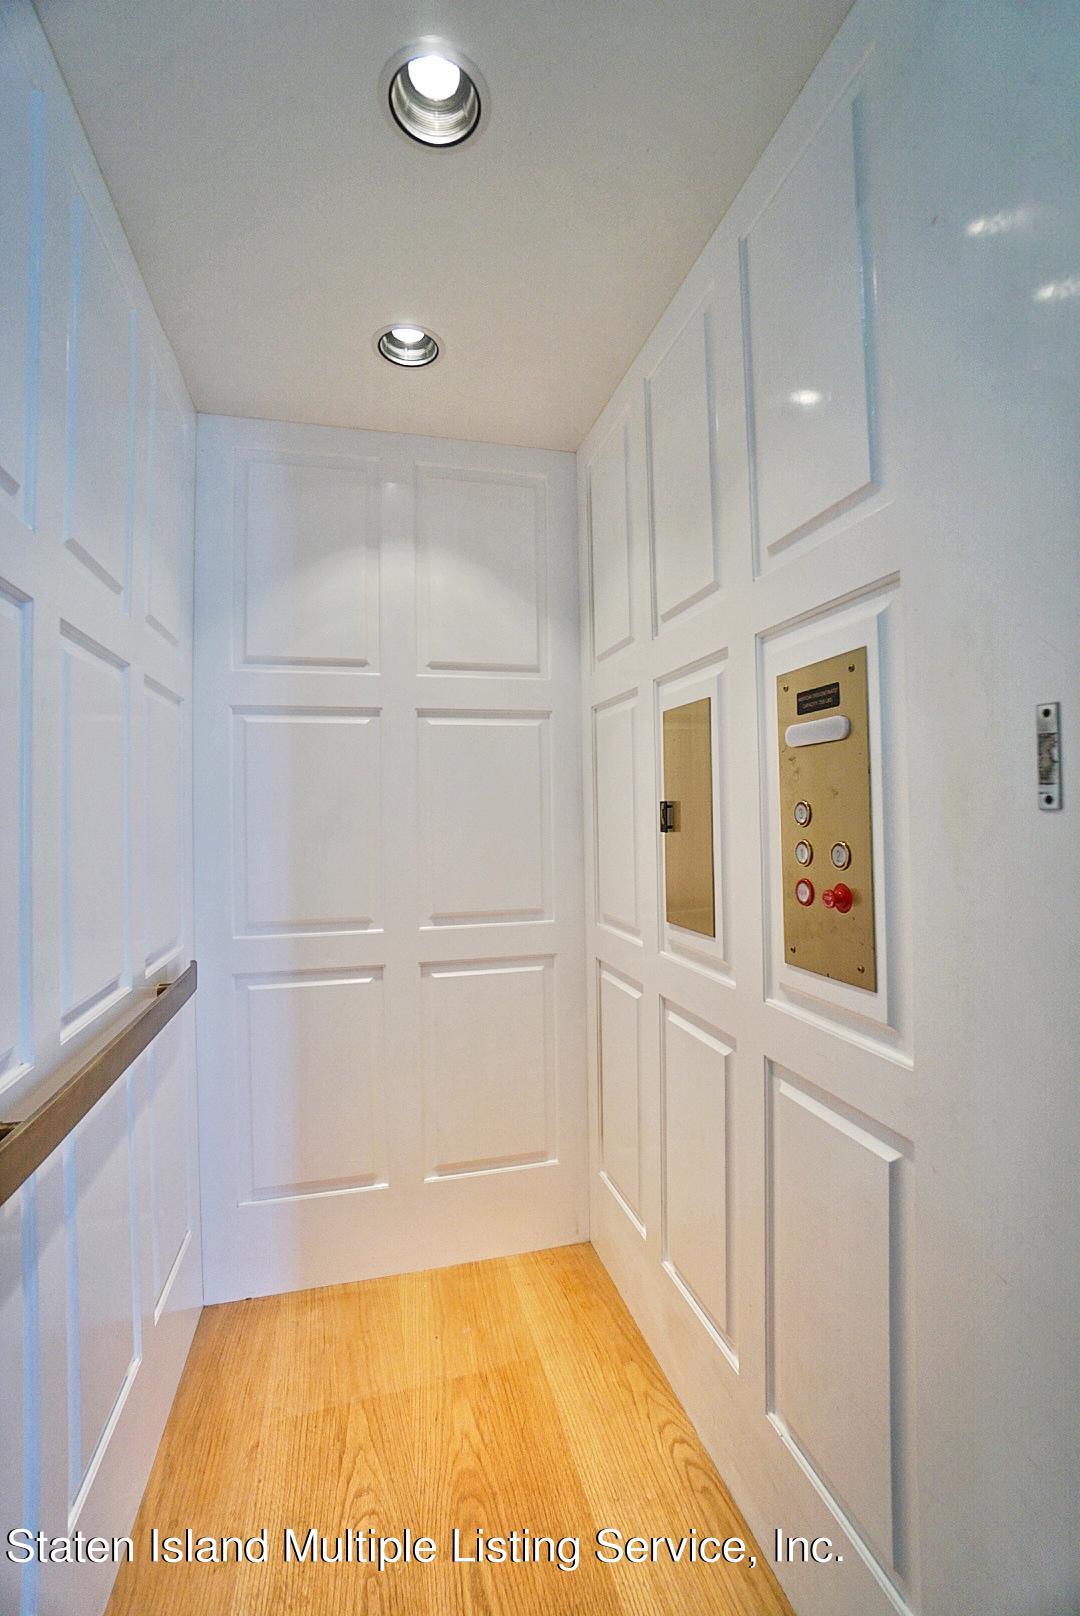 Single Family - Detached 129 Coverly Avenue   Staten Island, NY 10301, MLS-1144490-12